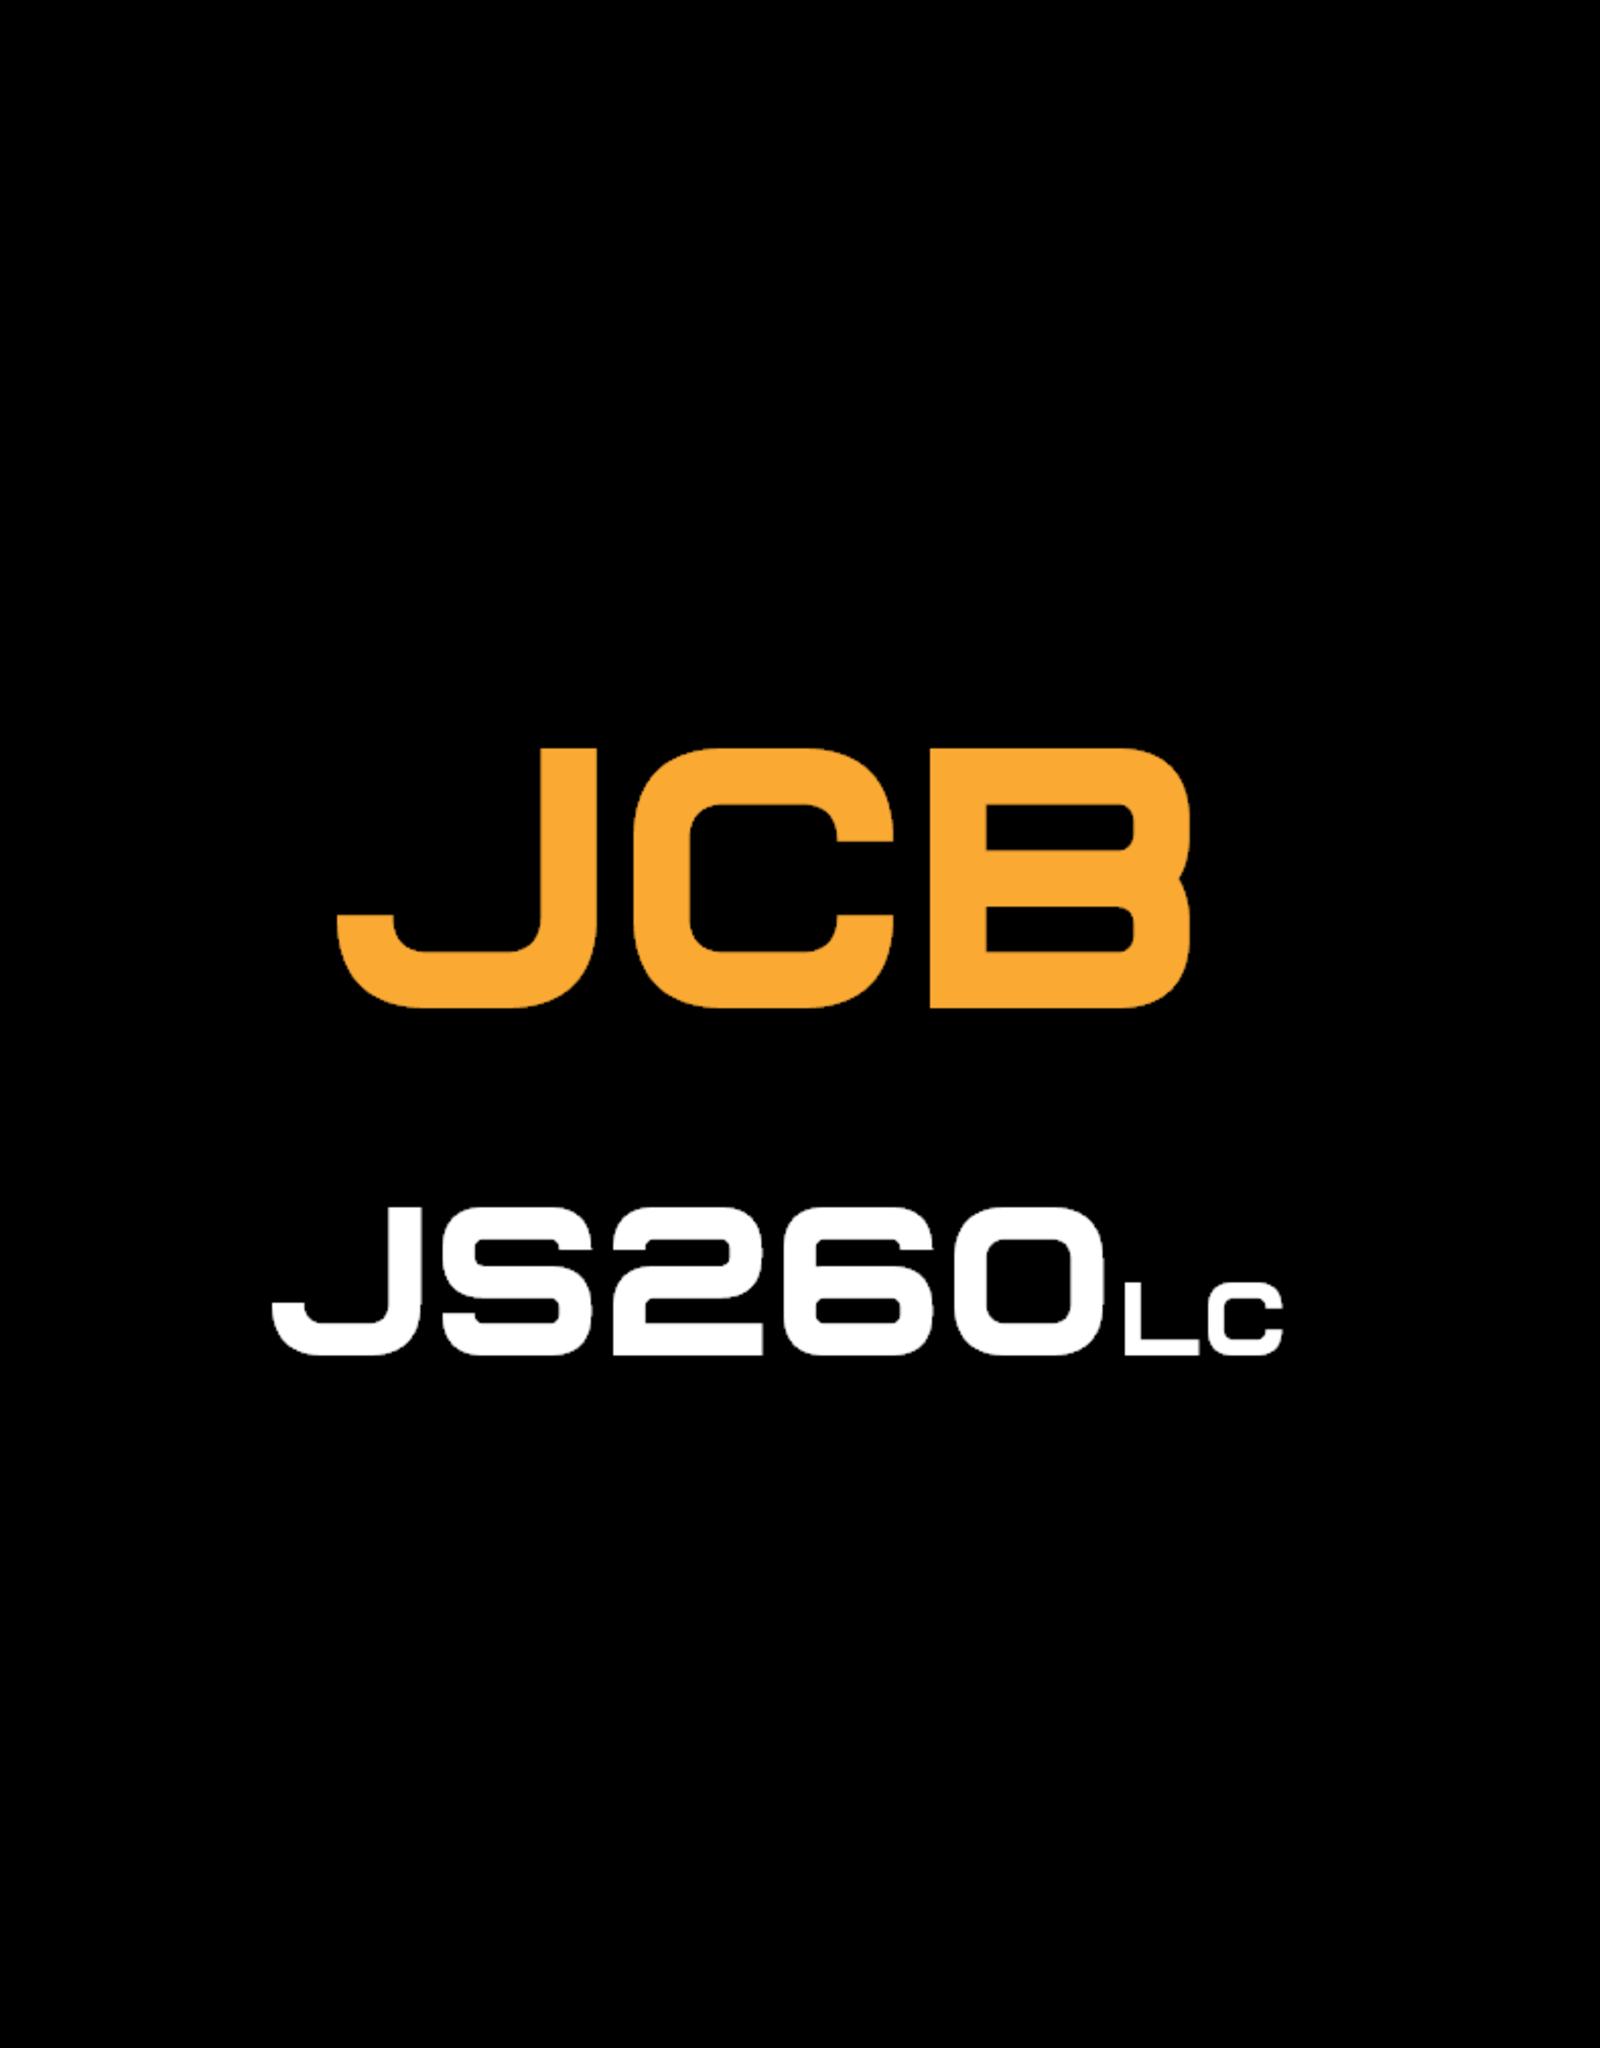 Echle Hartstahl GmbH FOPS für JCB JS260LC